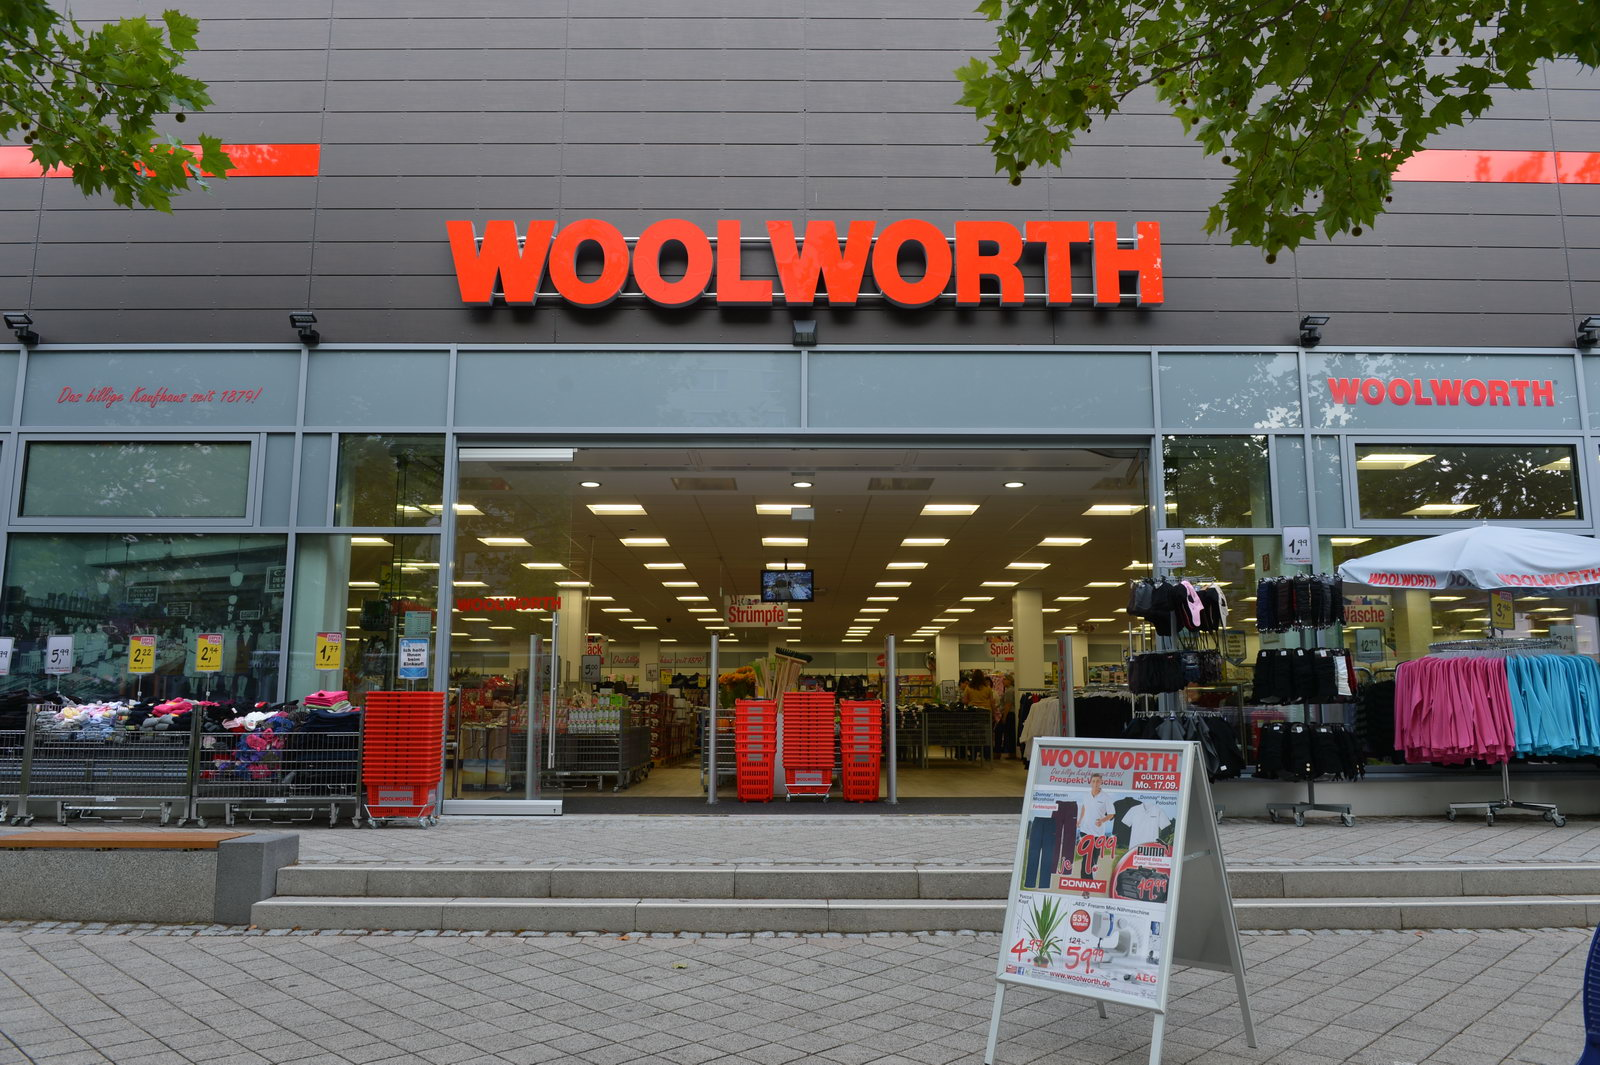 woolworth plant mehrere neue standorte. Black Bedroom Furniture Sets. Home Design Ideas